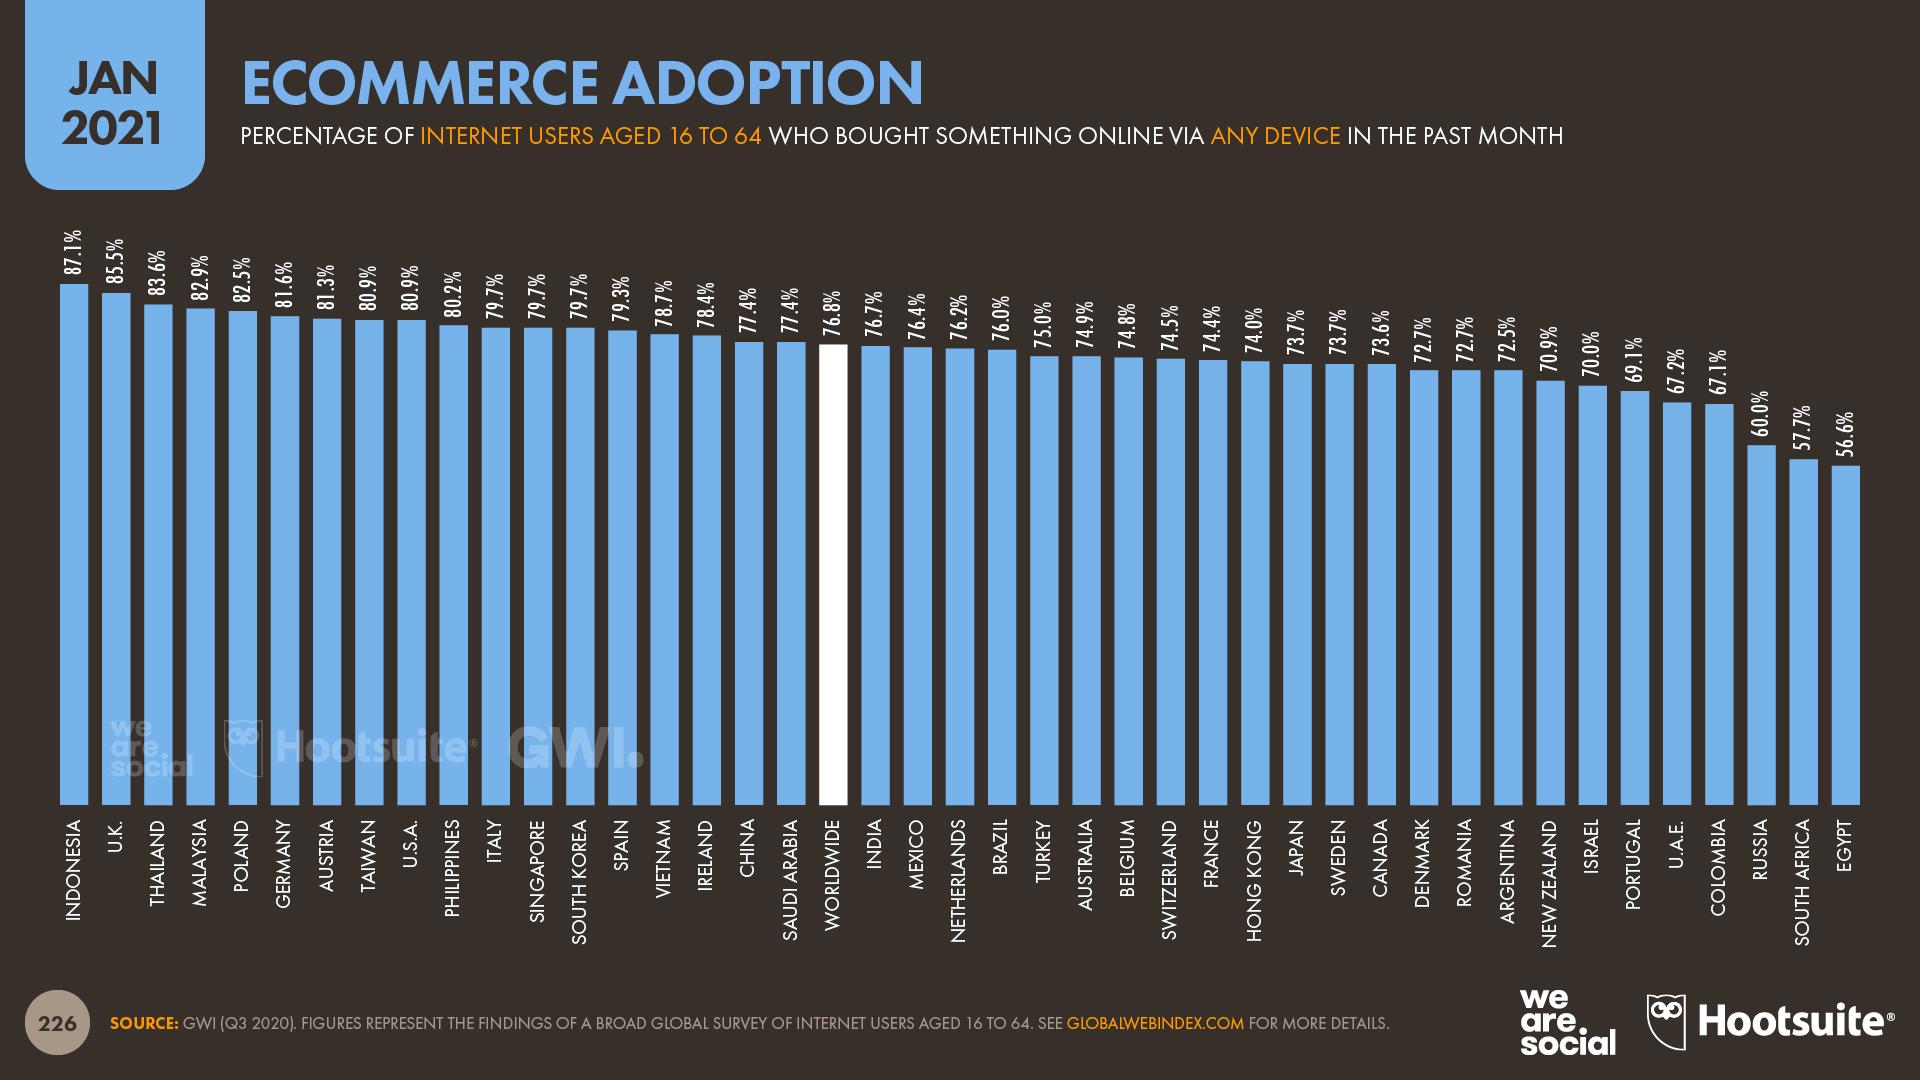 Ecommerce Adoption were social digital 2021